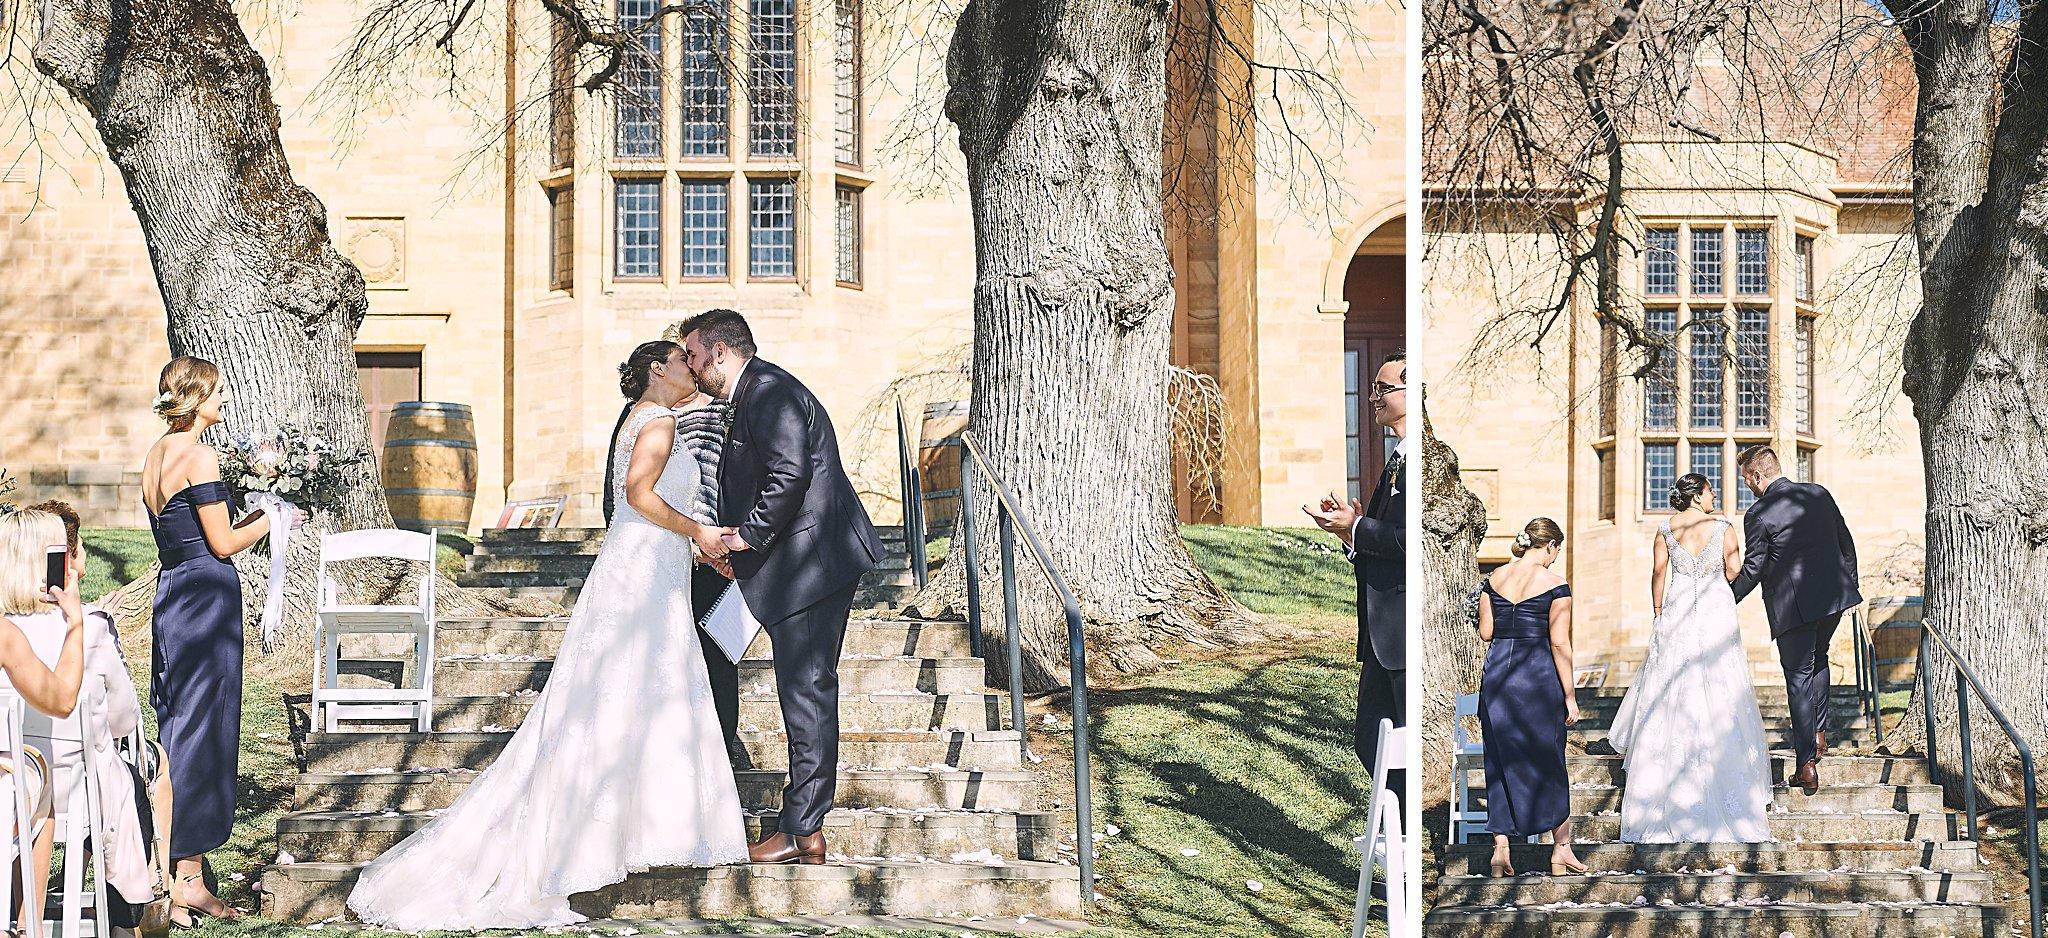 wedding_photographer_adelaide_0016.jpg